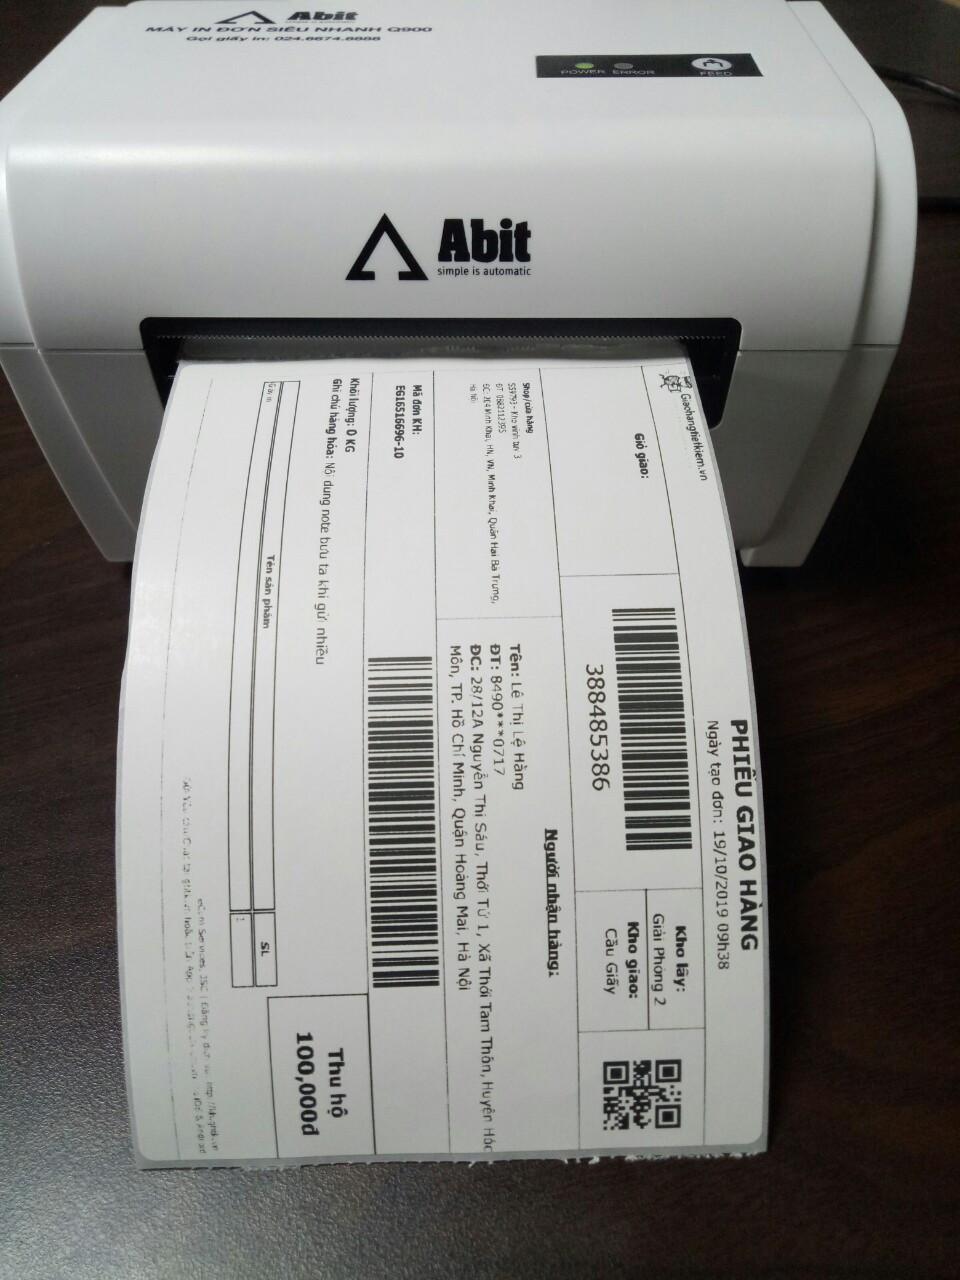 In vận đơn của Viettelpost, VNPOST, GHTK,GHN,SuperShip trên máy in Abit Q900